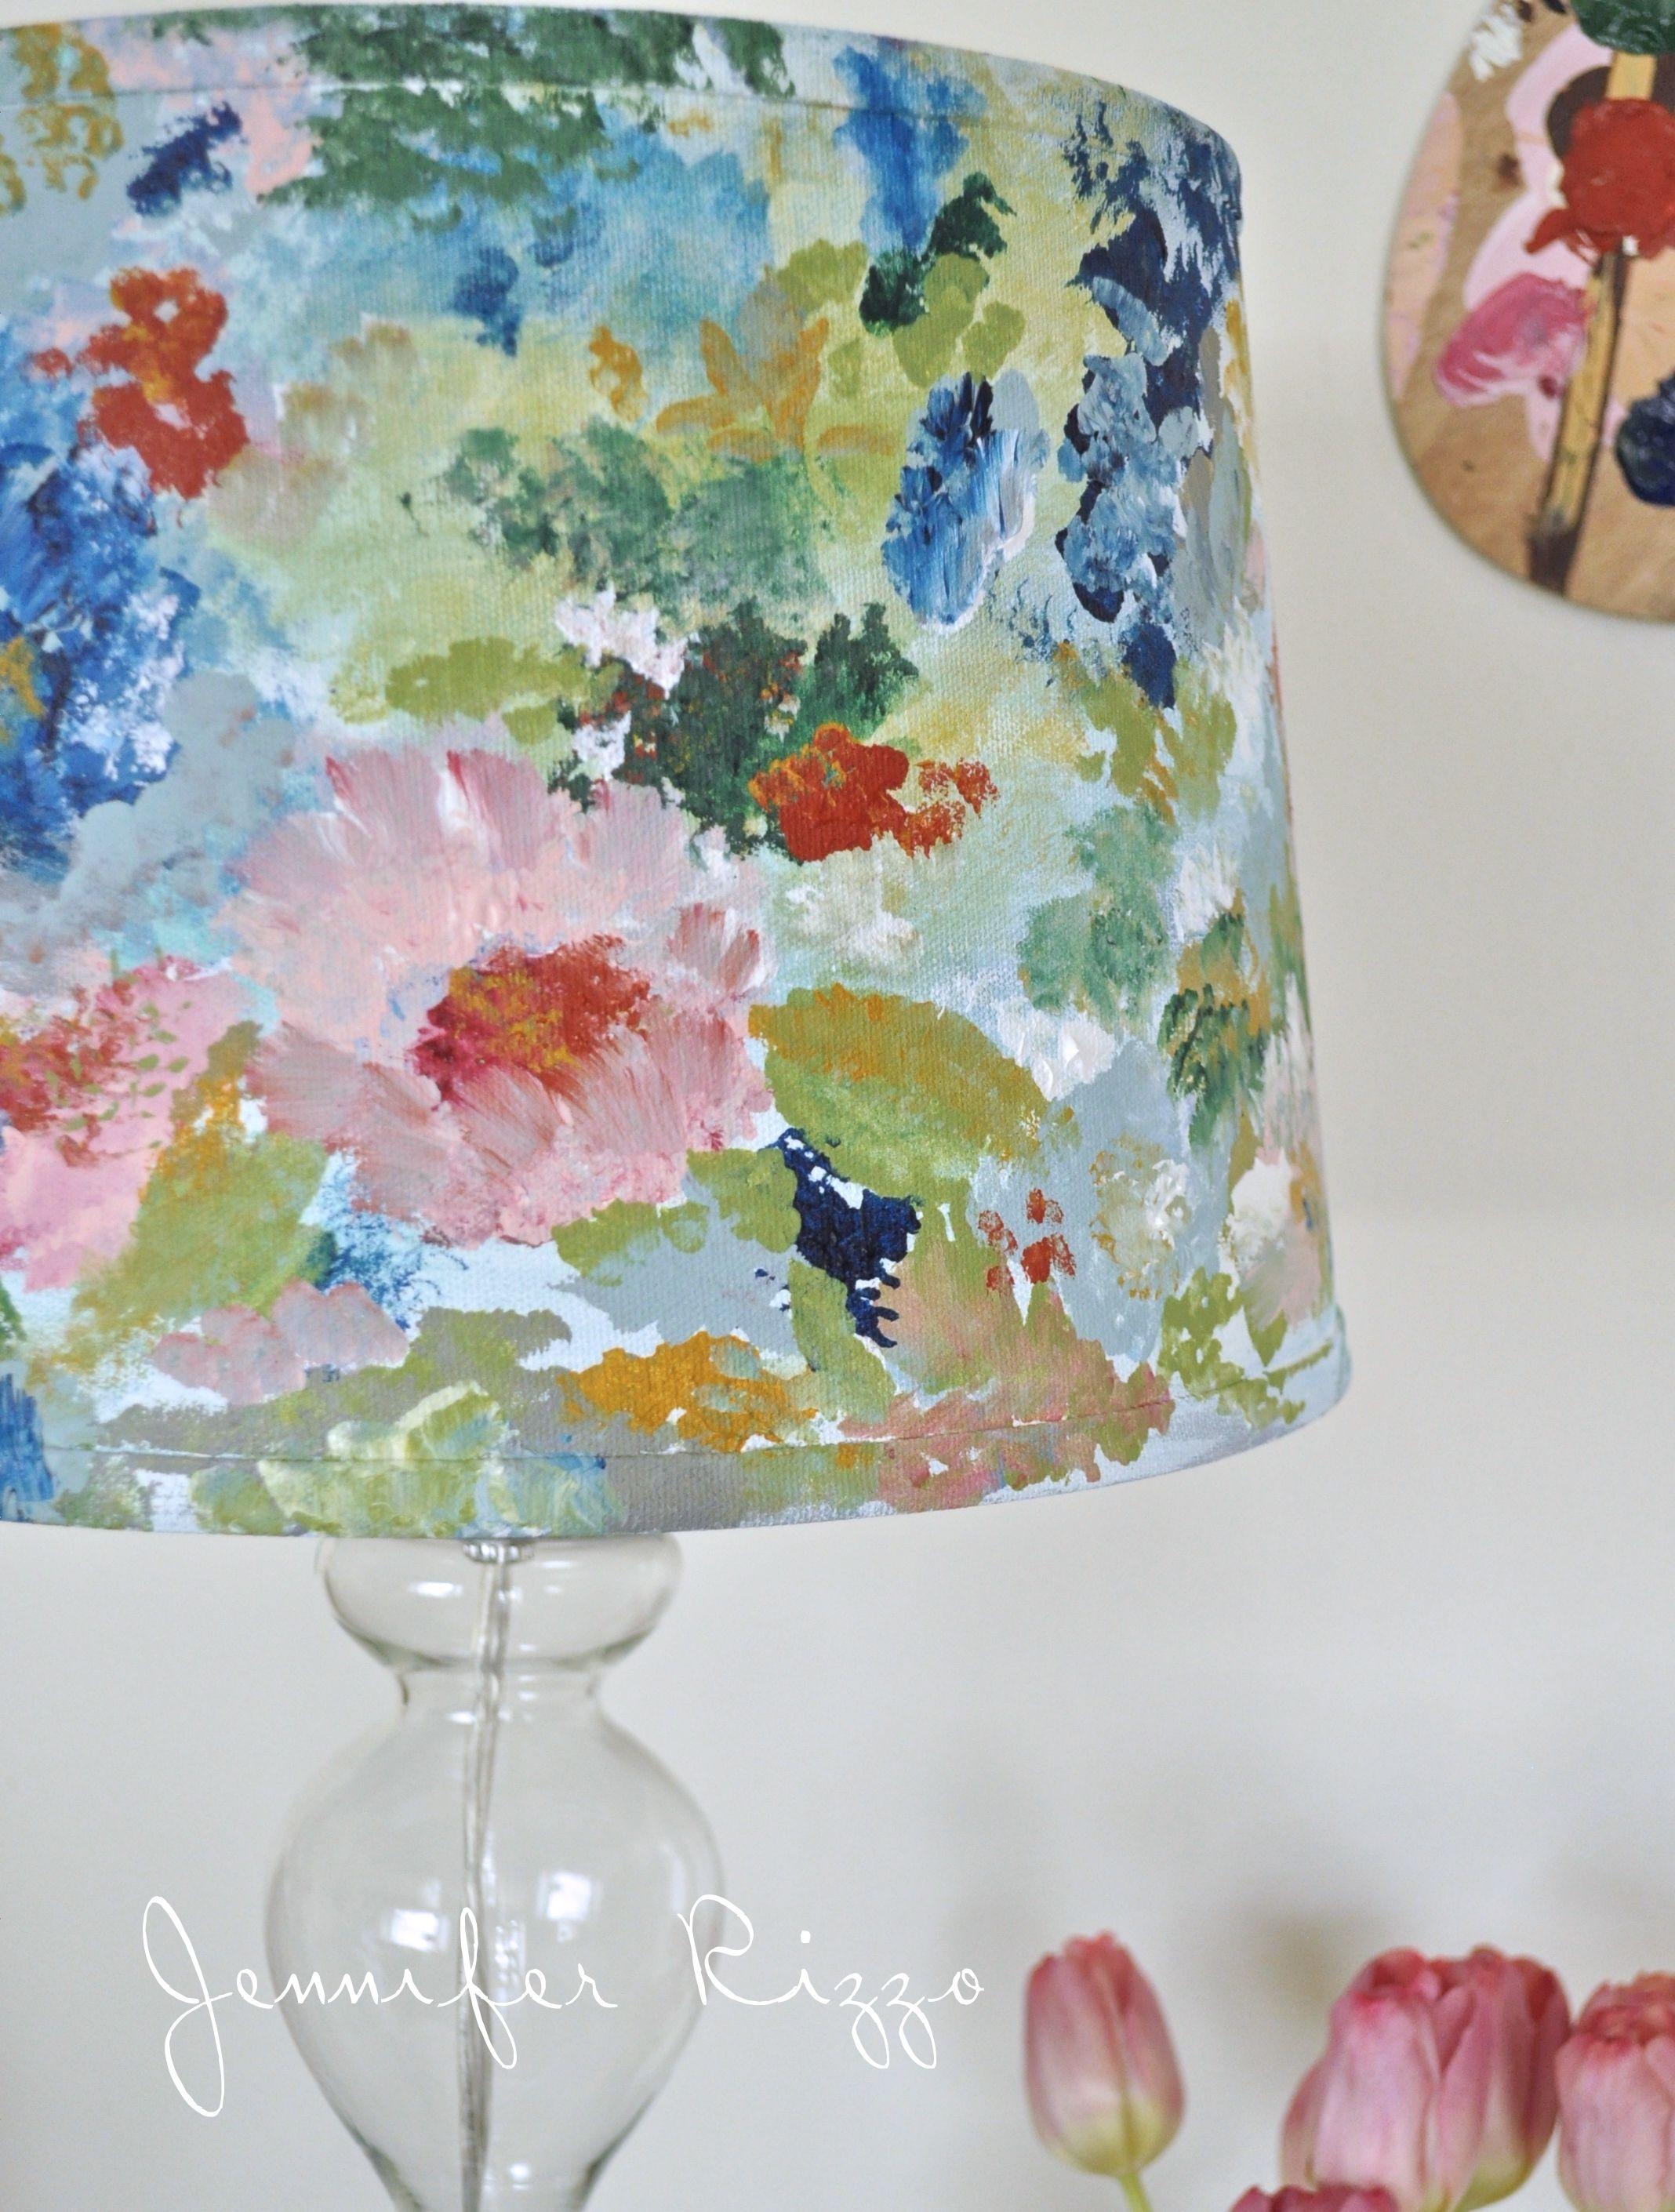 How To Paint An Artist S Palette Inspired Floral Lampshade Pantallas De Lamparas Pintadas Pantallas Pintadas A